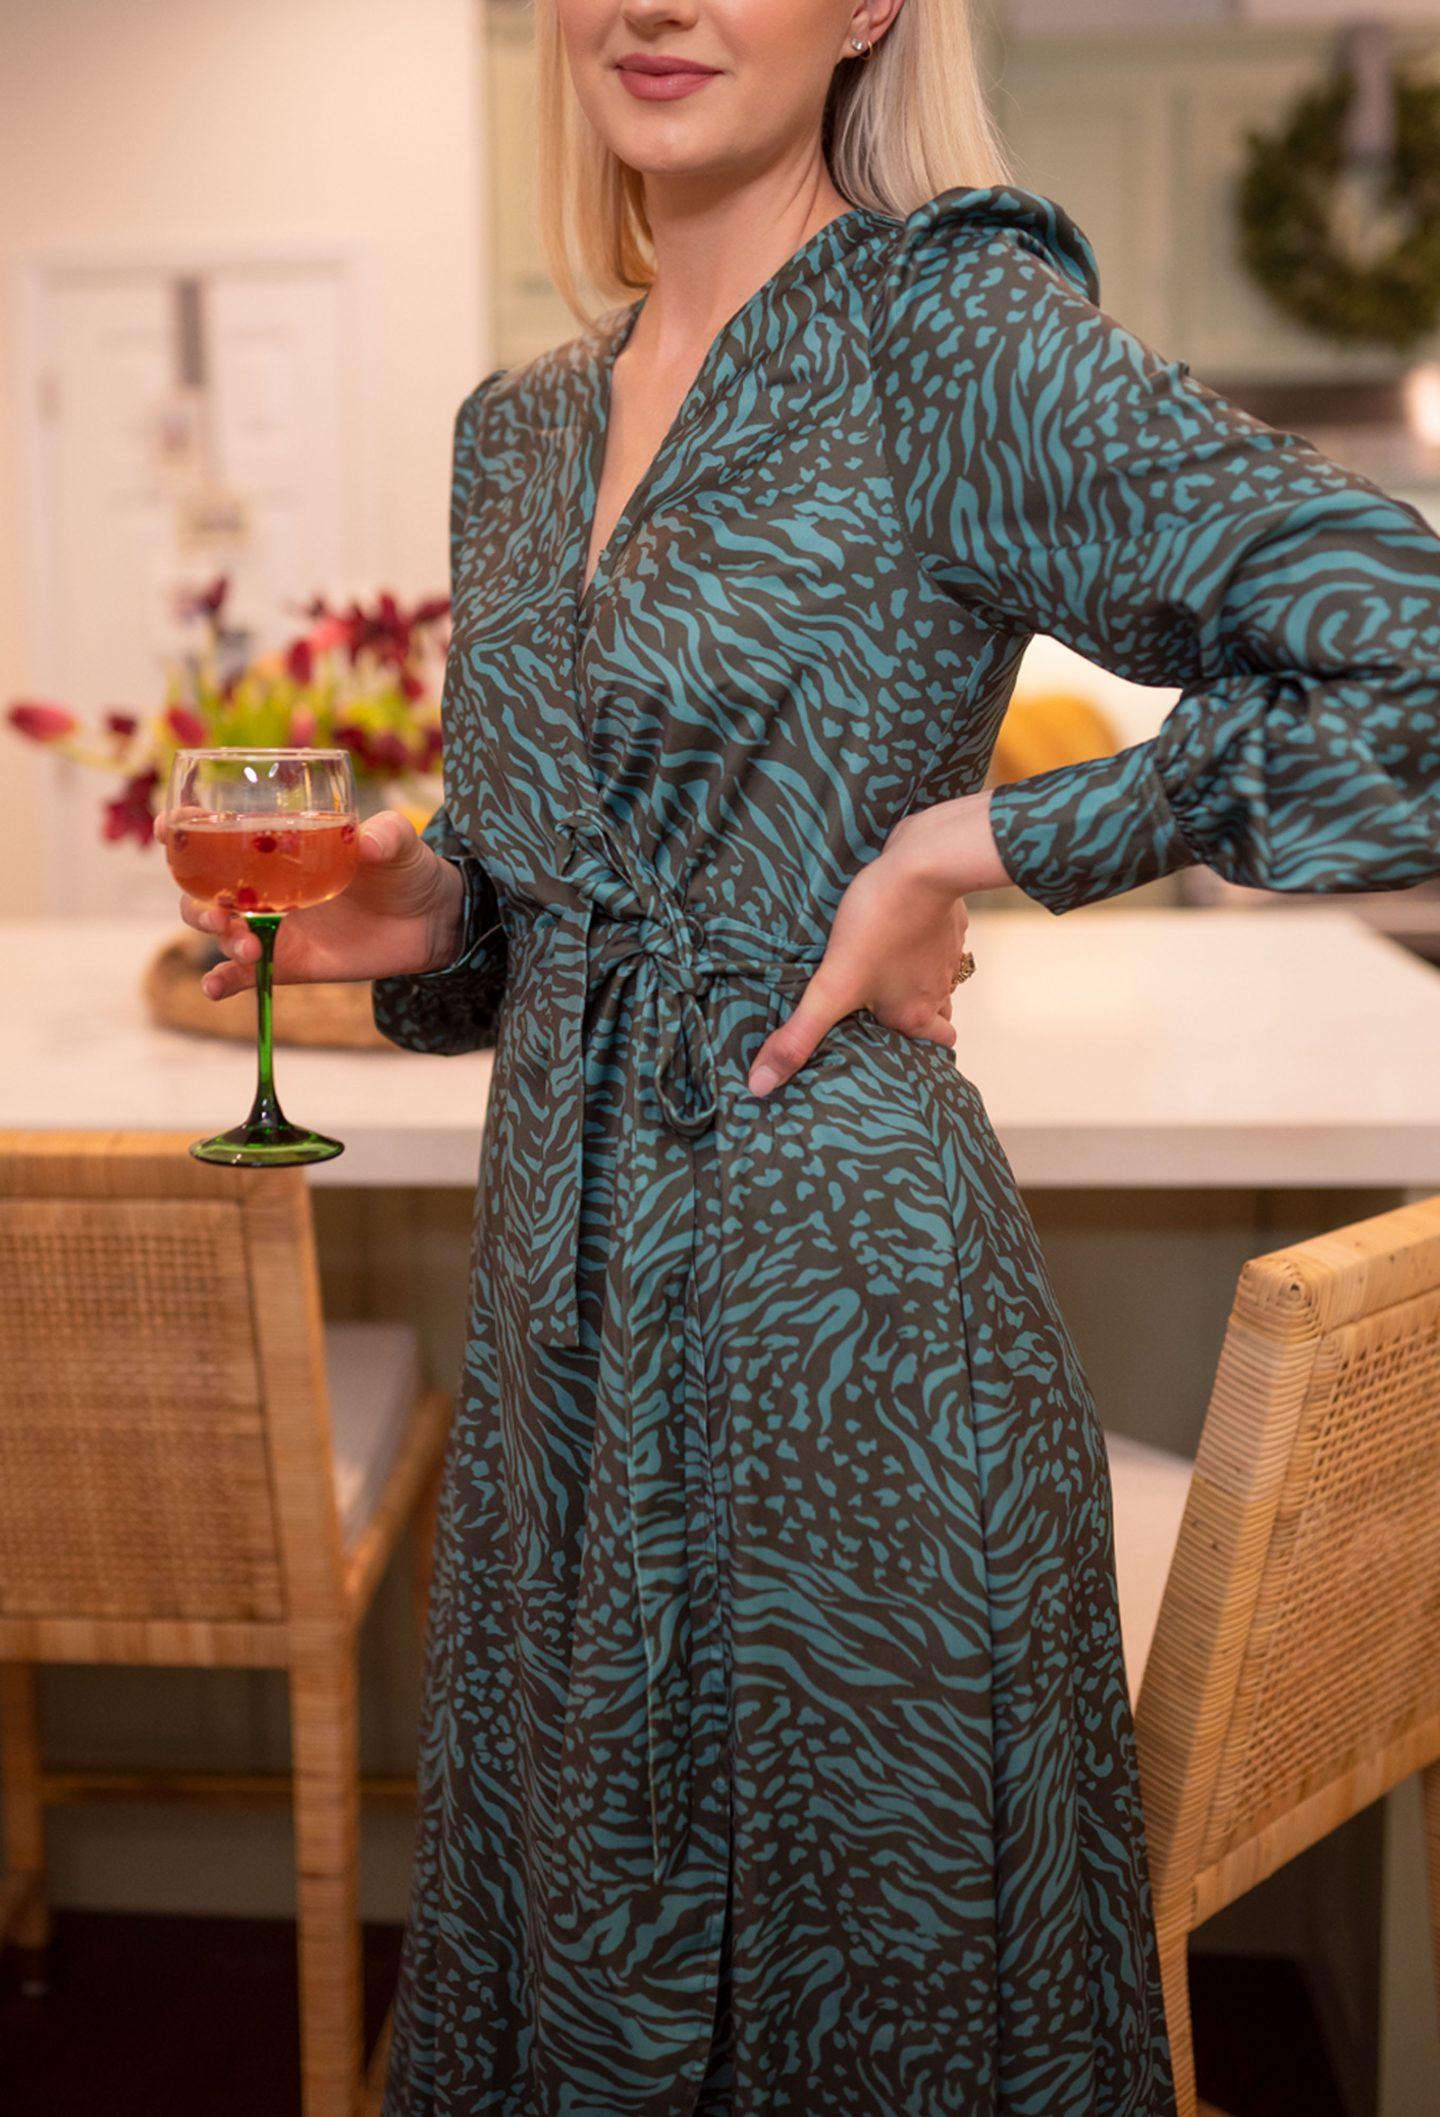 Abbey Glass dress worn by Ashley Brooke in her kitchen